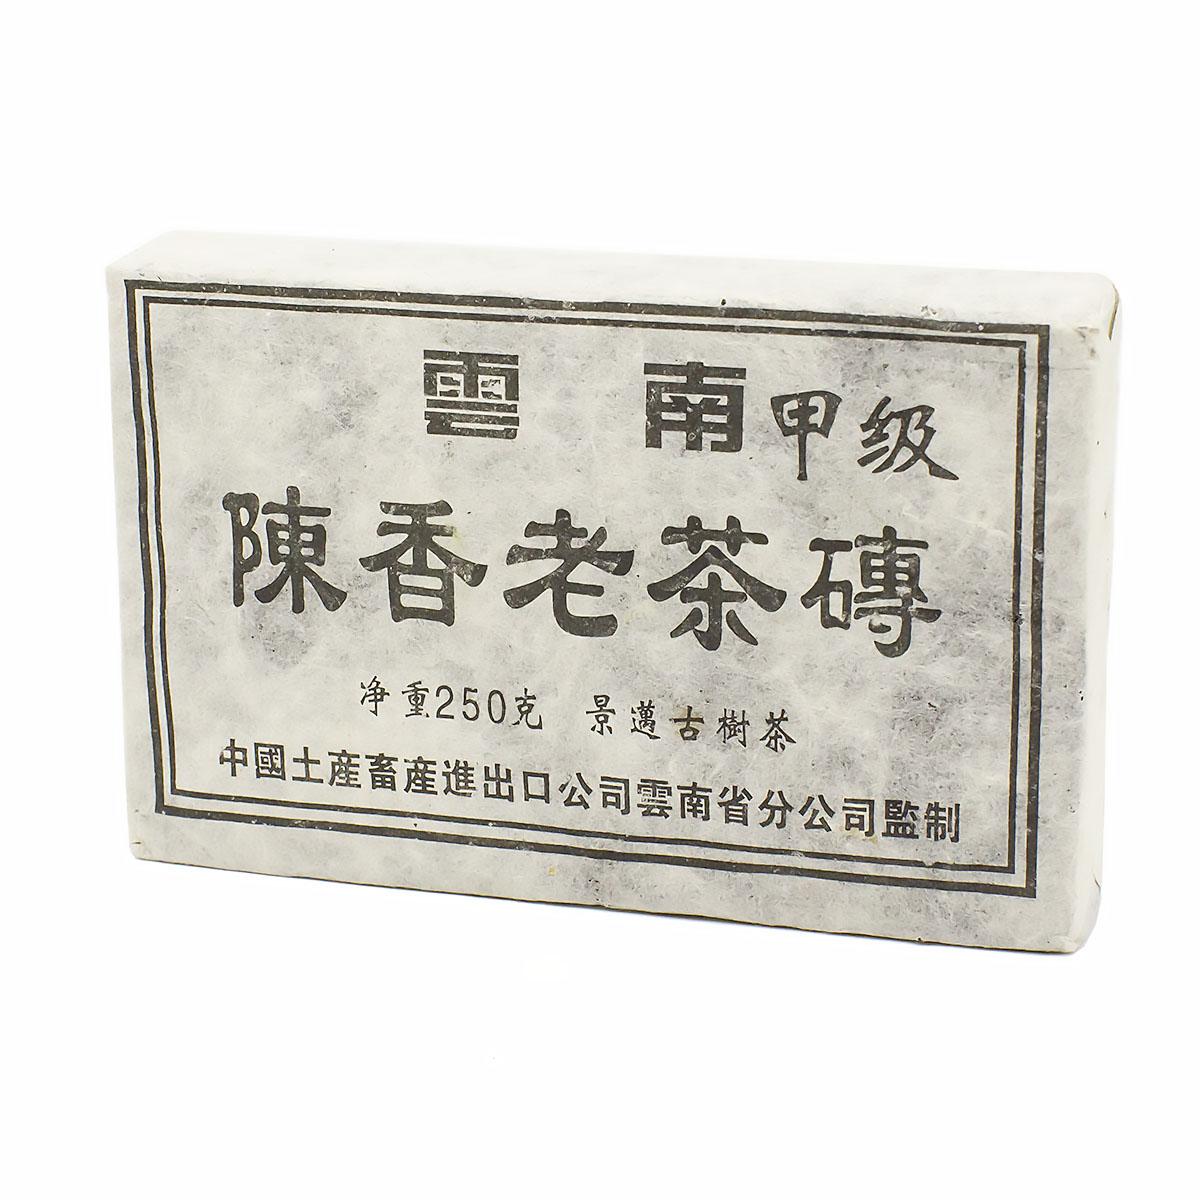 Лао Ча Тоу Юньнань, фабрика Юньхай Ча, Линцан, 2012 г., кирпич 250 гр. c pe108 yunnan puerh сырой чай 357g древние деревья пуэр чай юньнань семь суб торта старые старые старые деревья